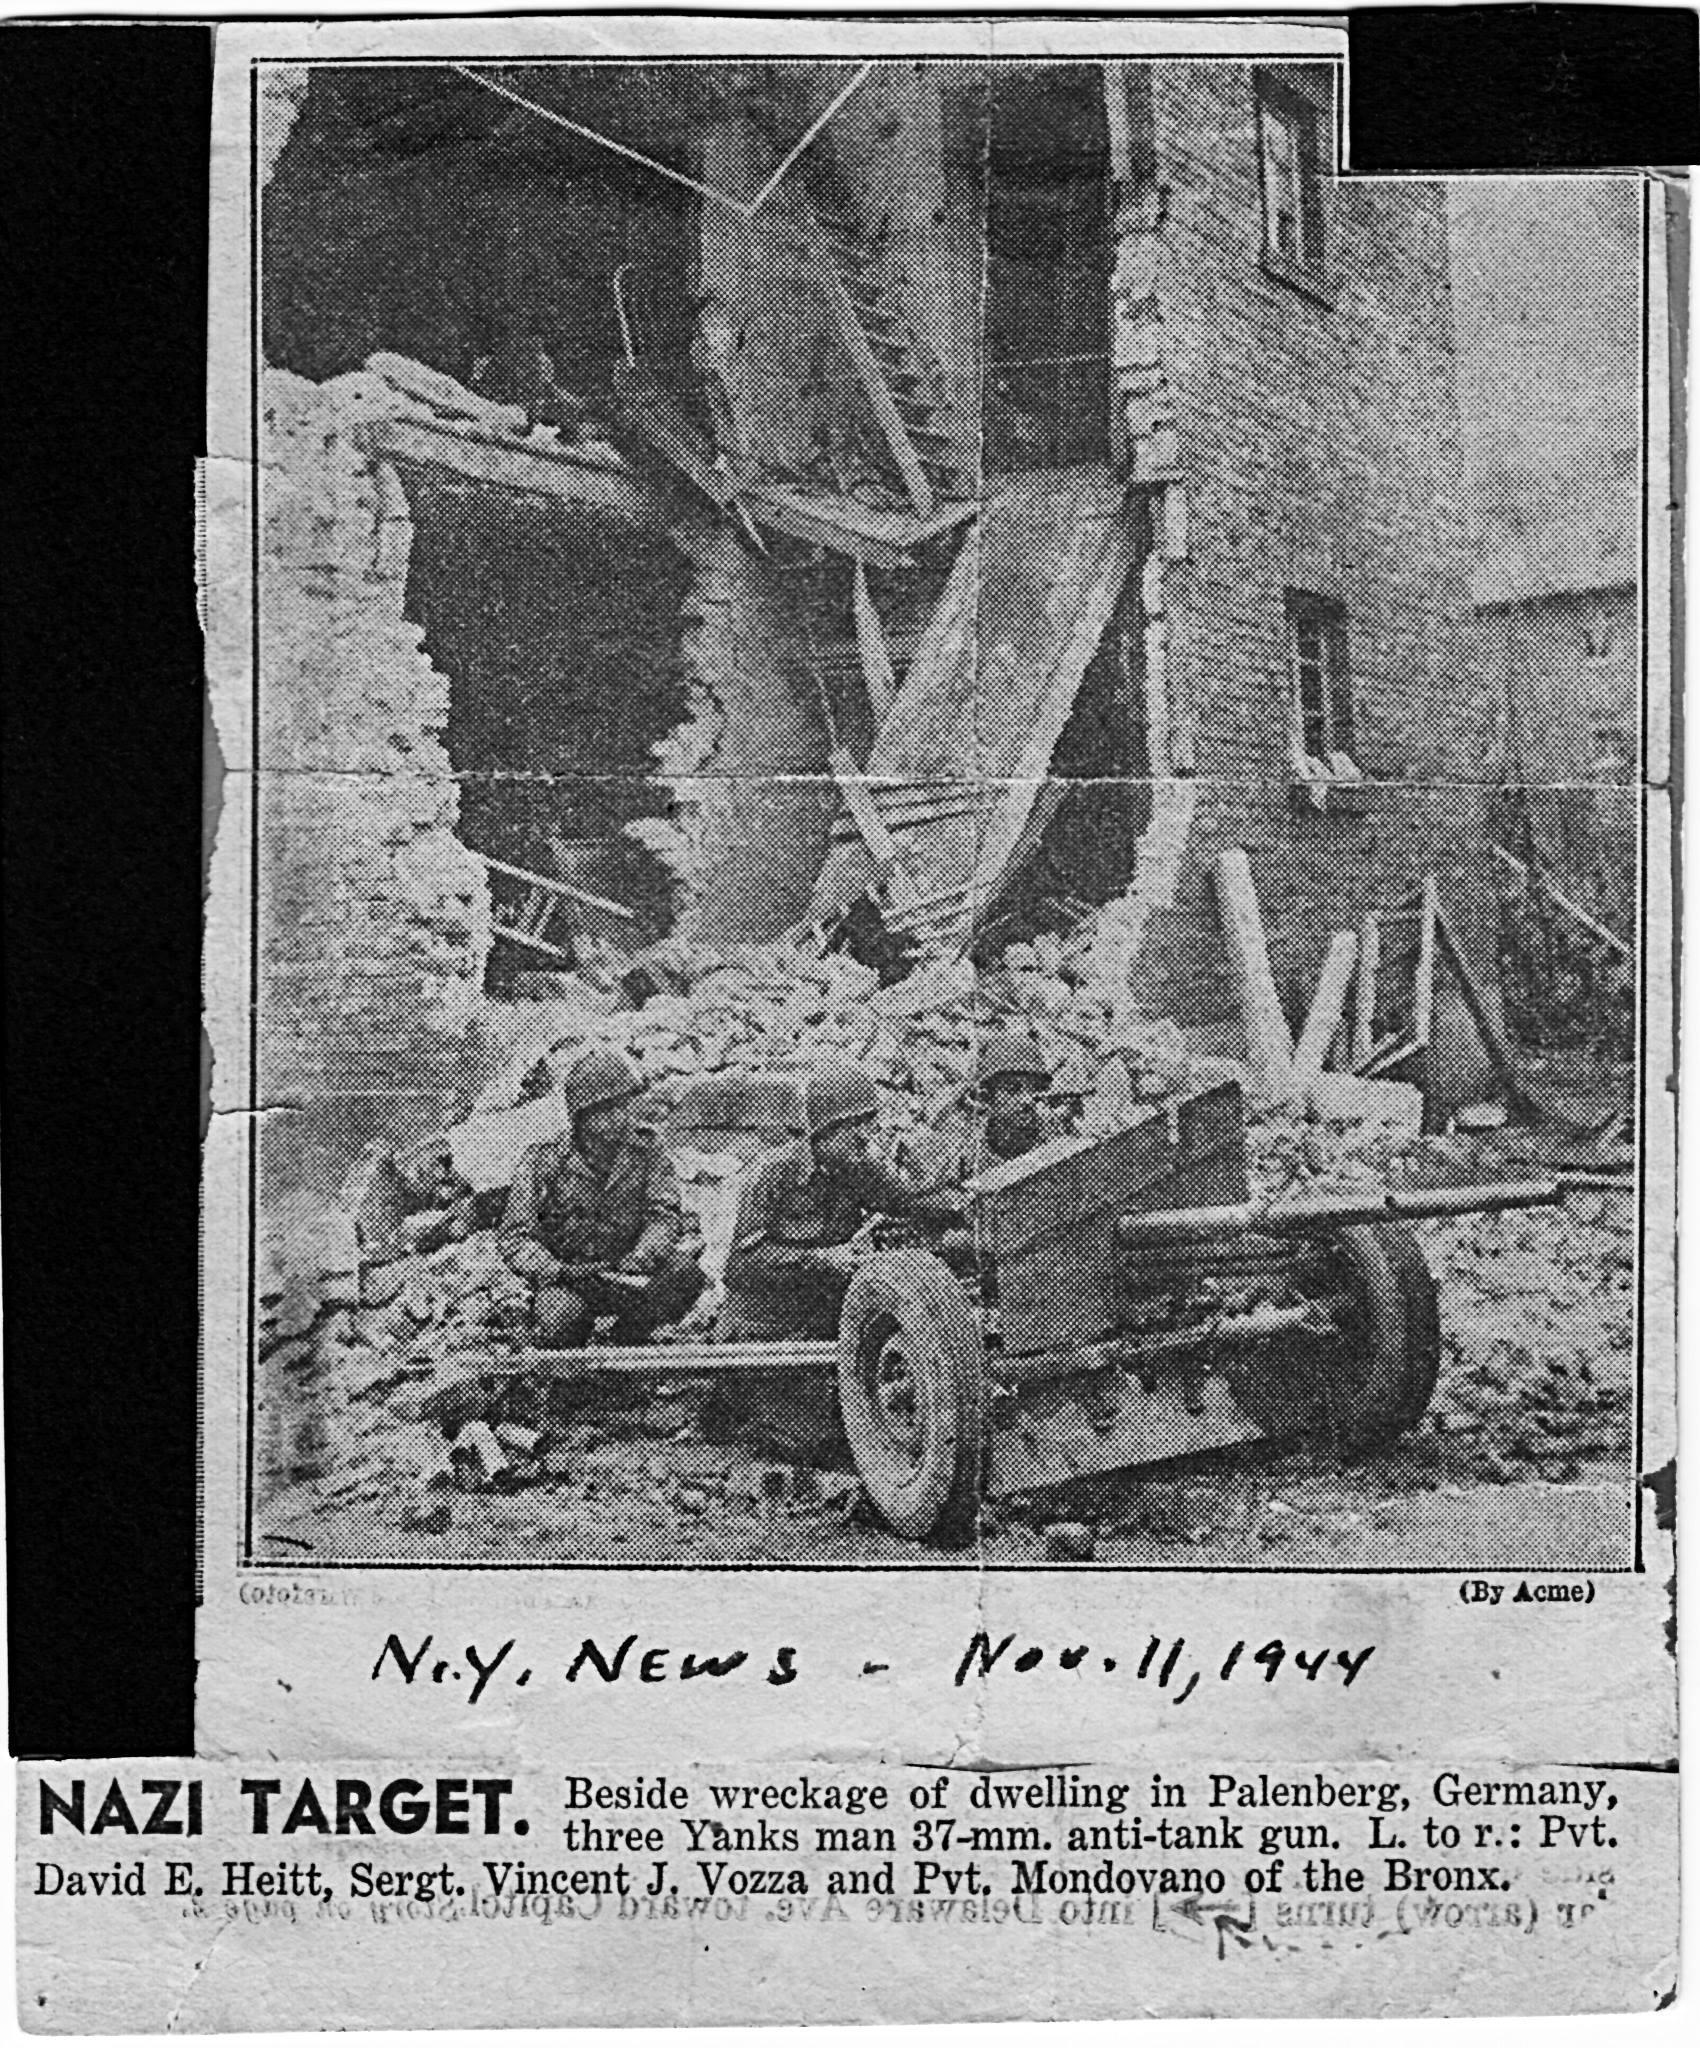 David E. (Edd) Hiett of C Company, Newspaper November 1944 Palenberg, Germany